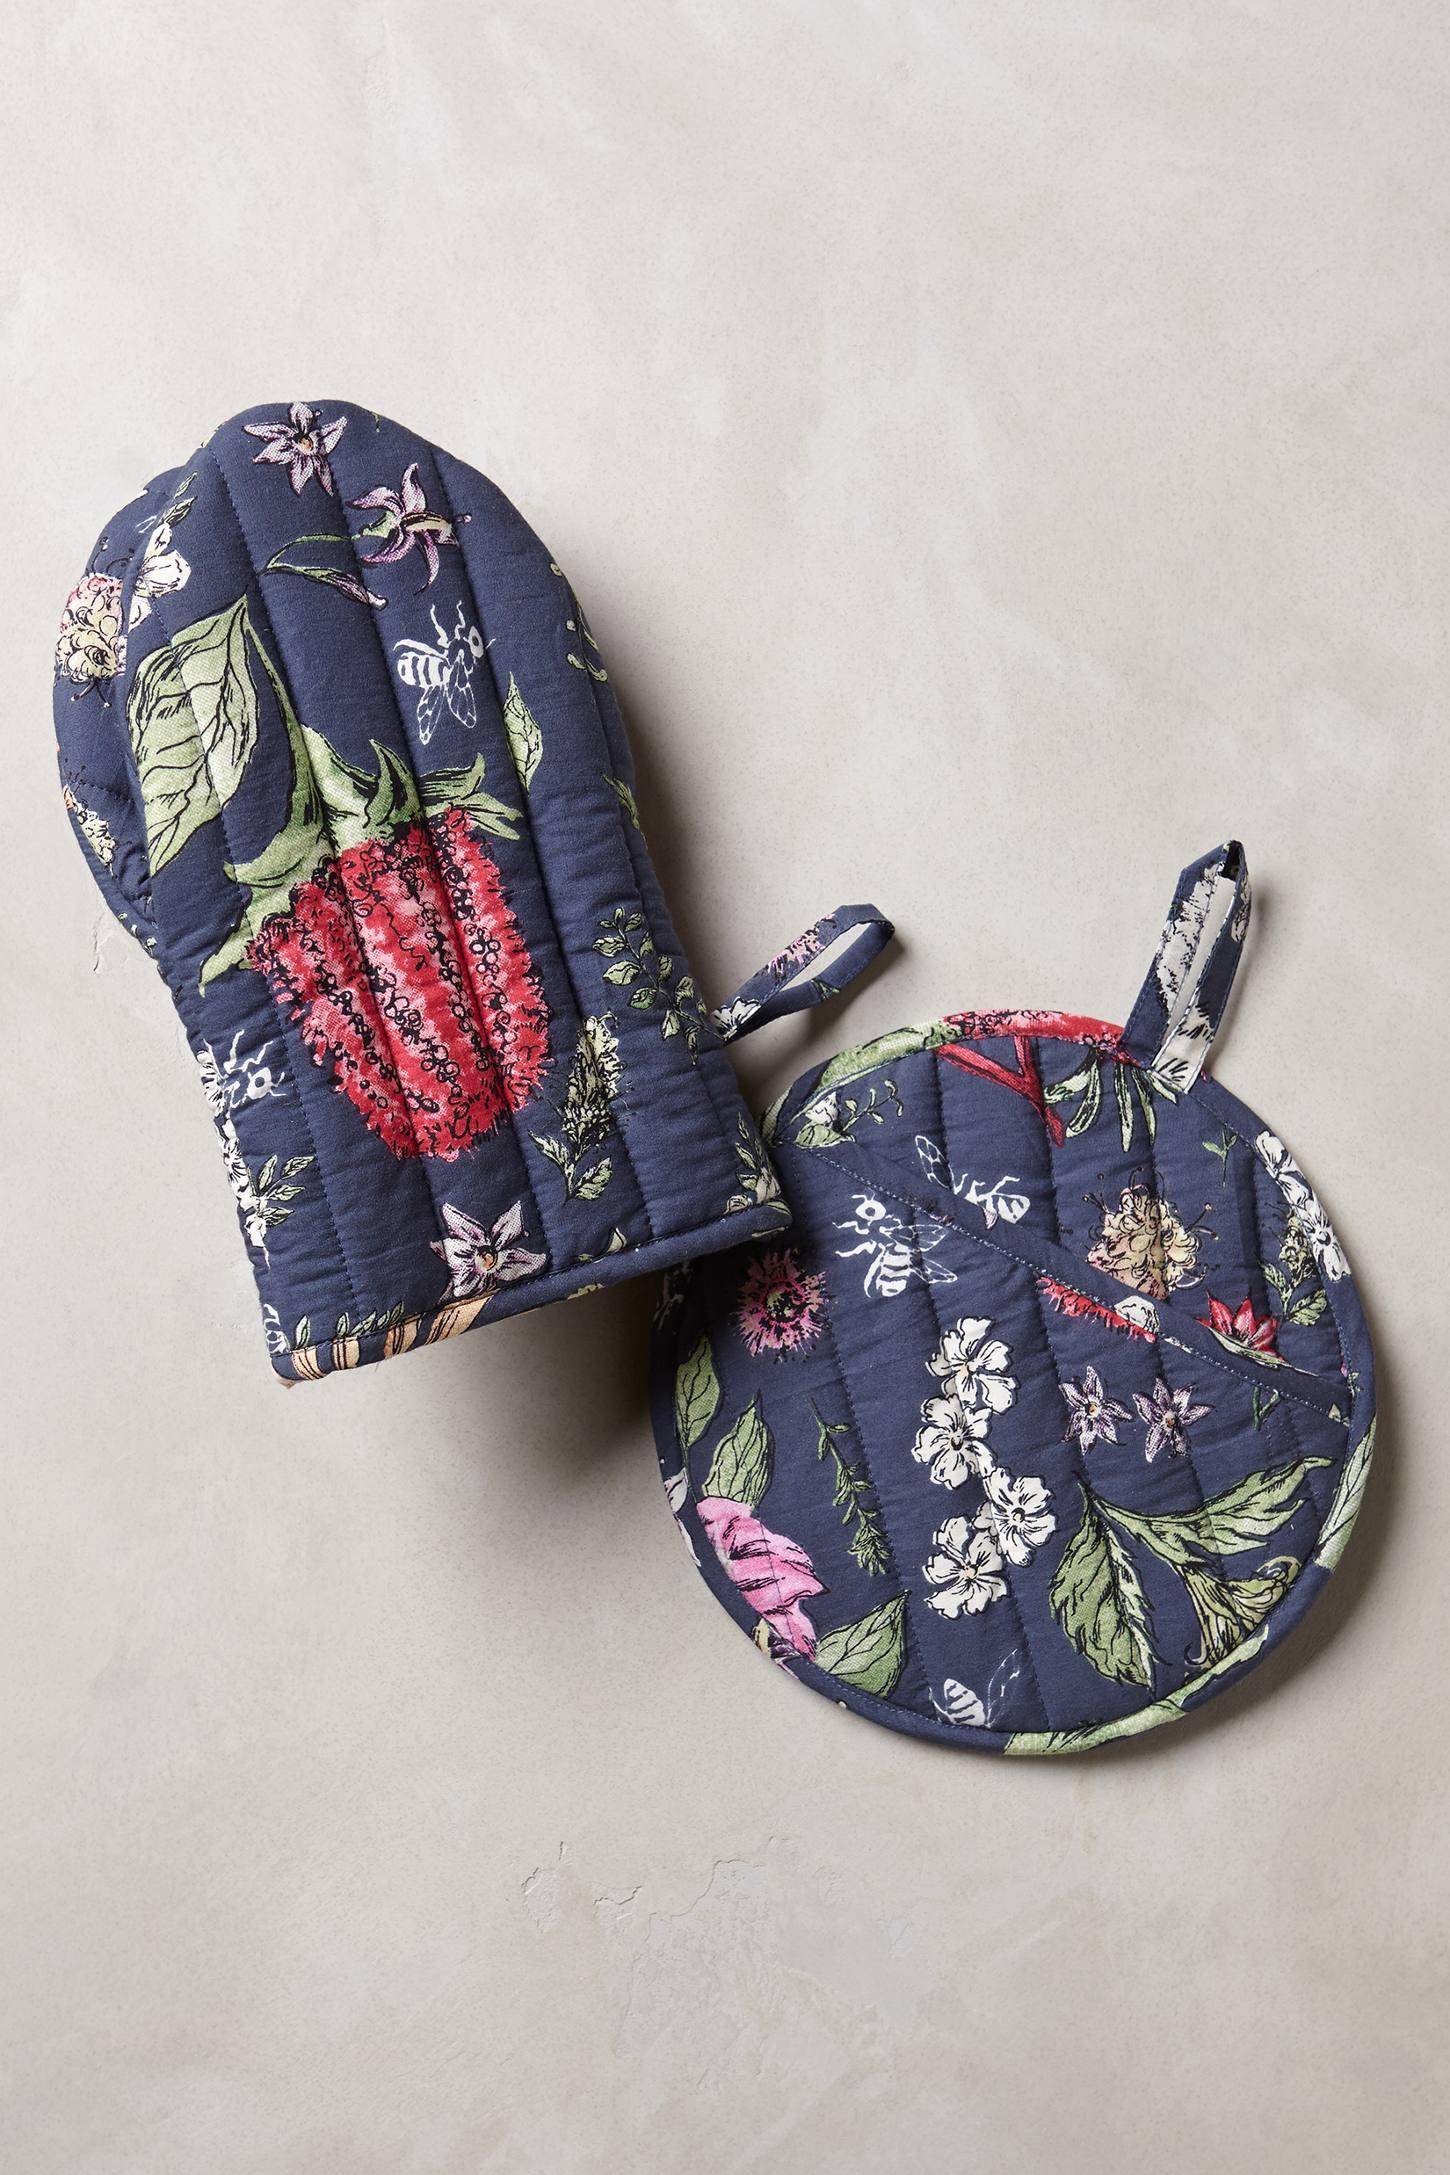 Butterfly Garden Potholders